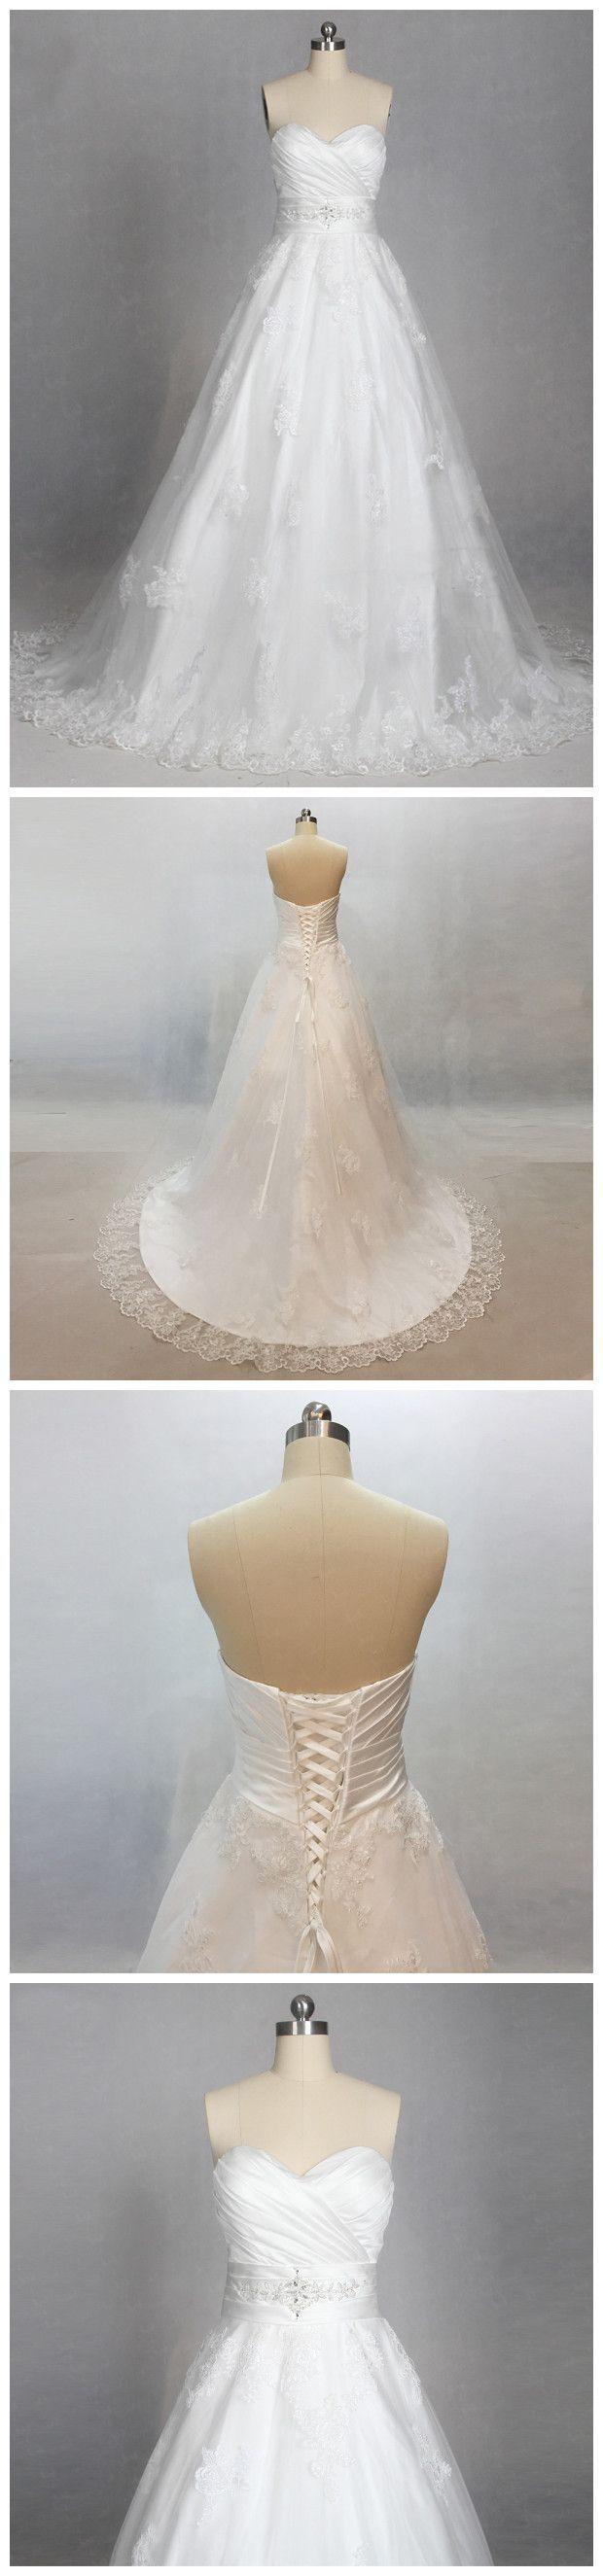 Wedding decorations for church december 2018  best Wedding Dresses  images on Pinterest